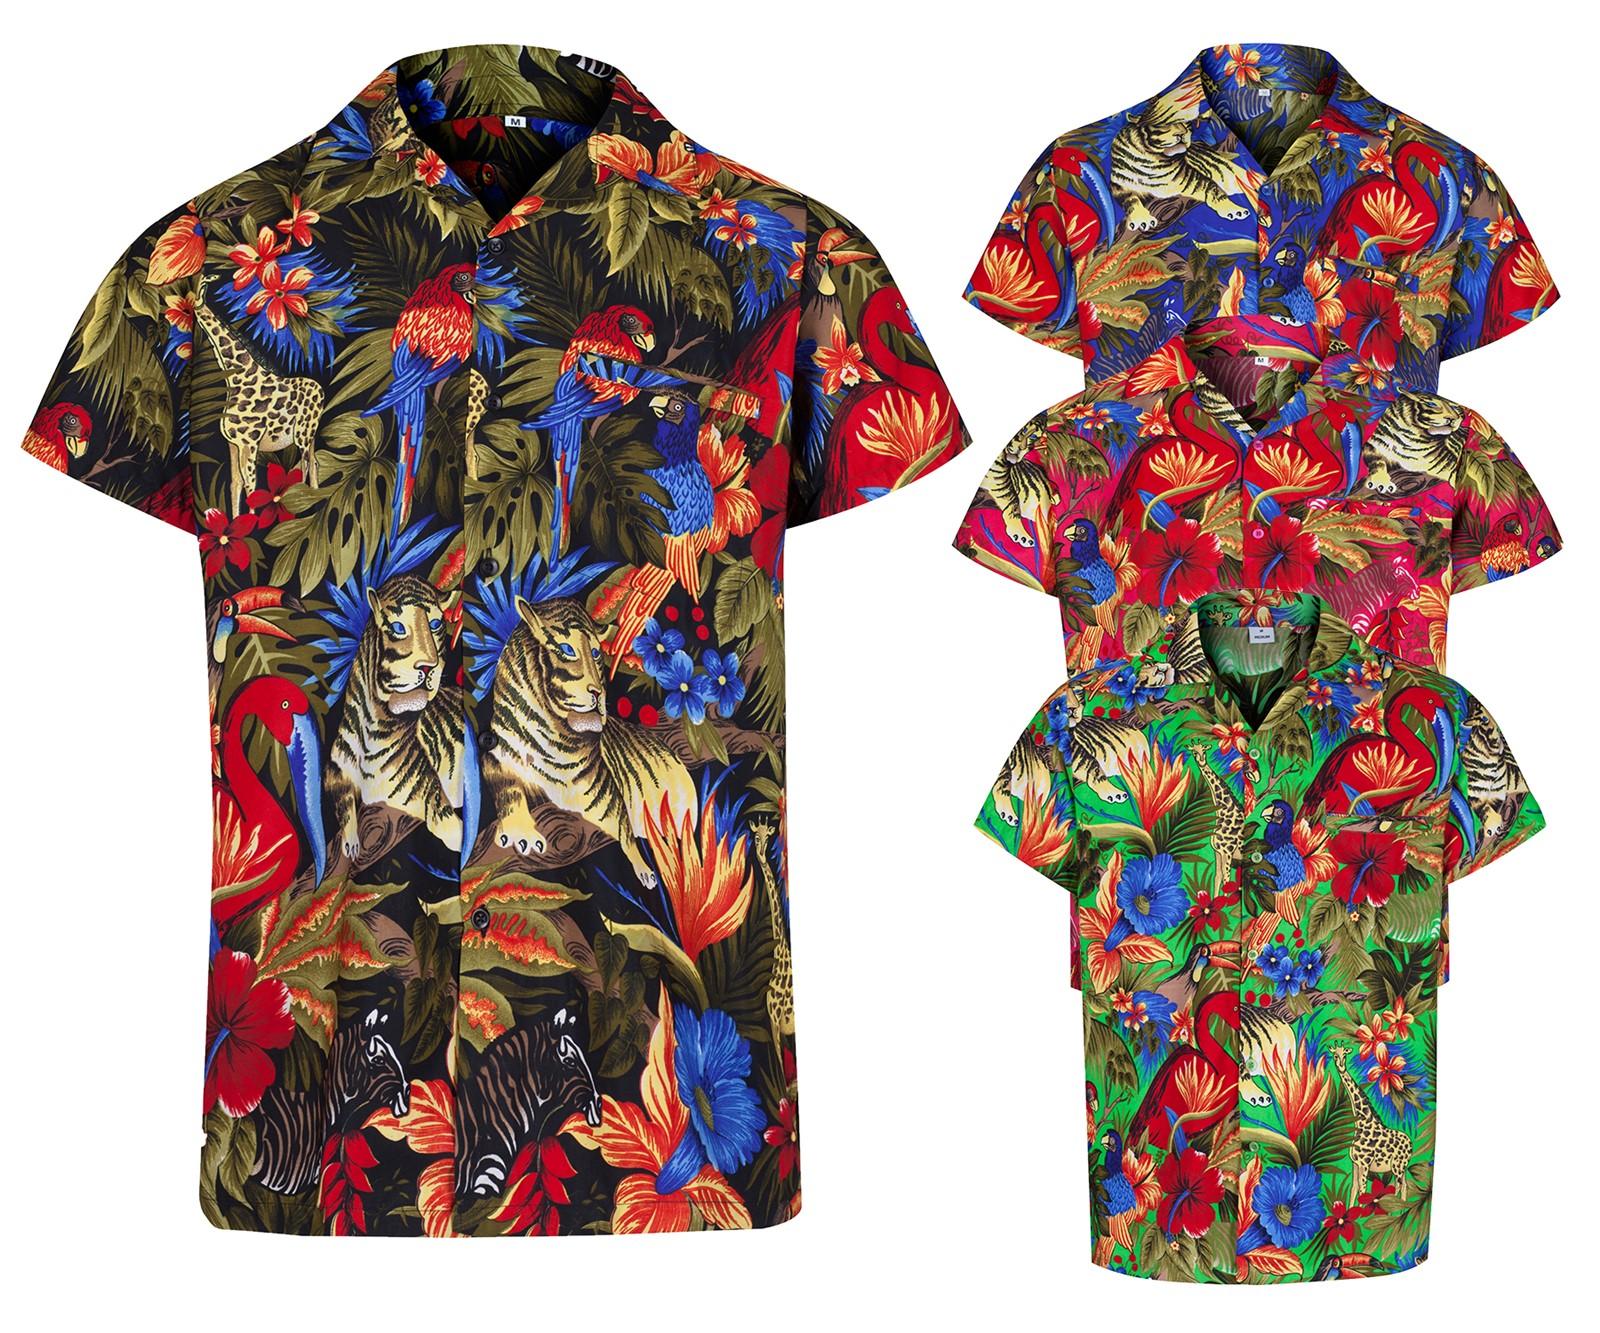 Mens hawaiian shirt aloha hawaii themed party shirt for Hawaiian shirt fancy dress